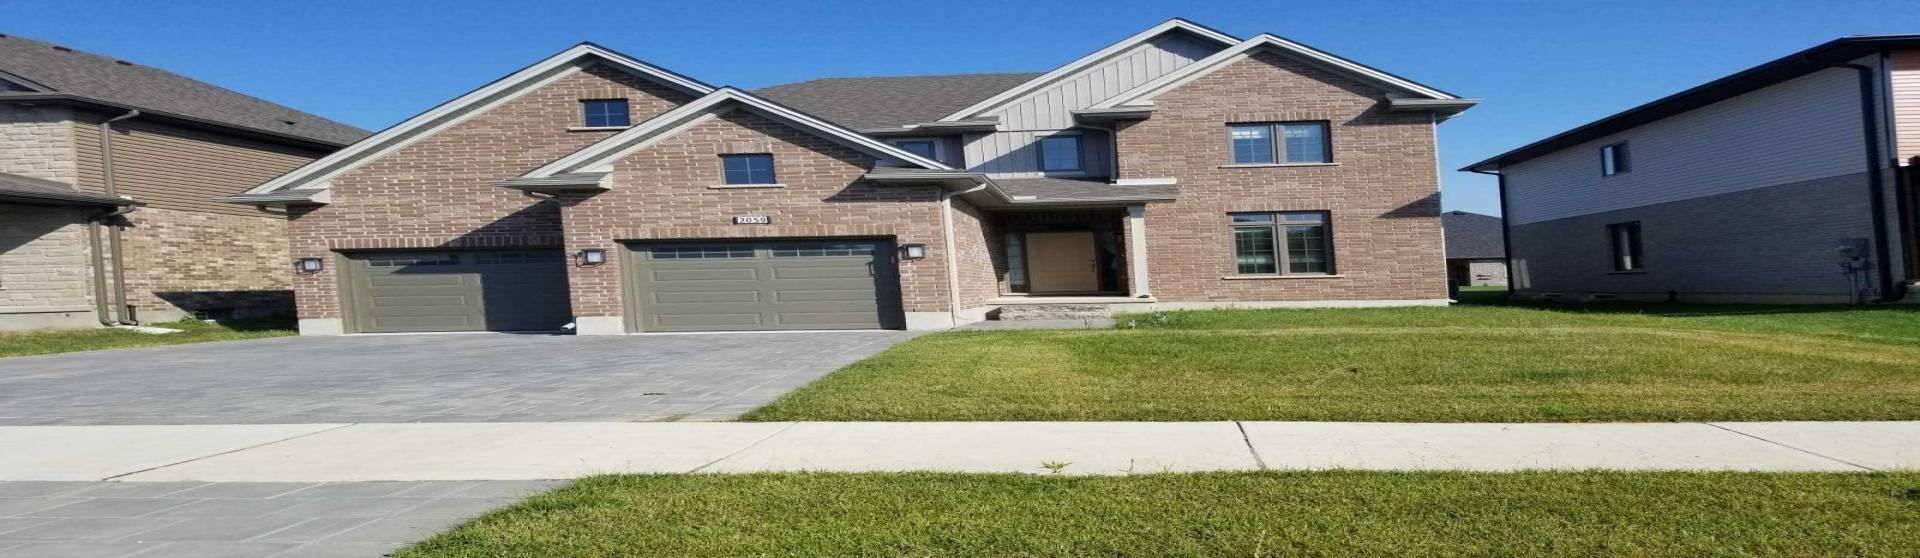 2059 Bakervilla St- London- Ontario N6P 0E9, 4 Bedrooms Bedrooms, 6 Rooms Rooms,3 BathroomsBathrooms,Detached,Lease,Bakervilla,X4812468